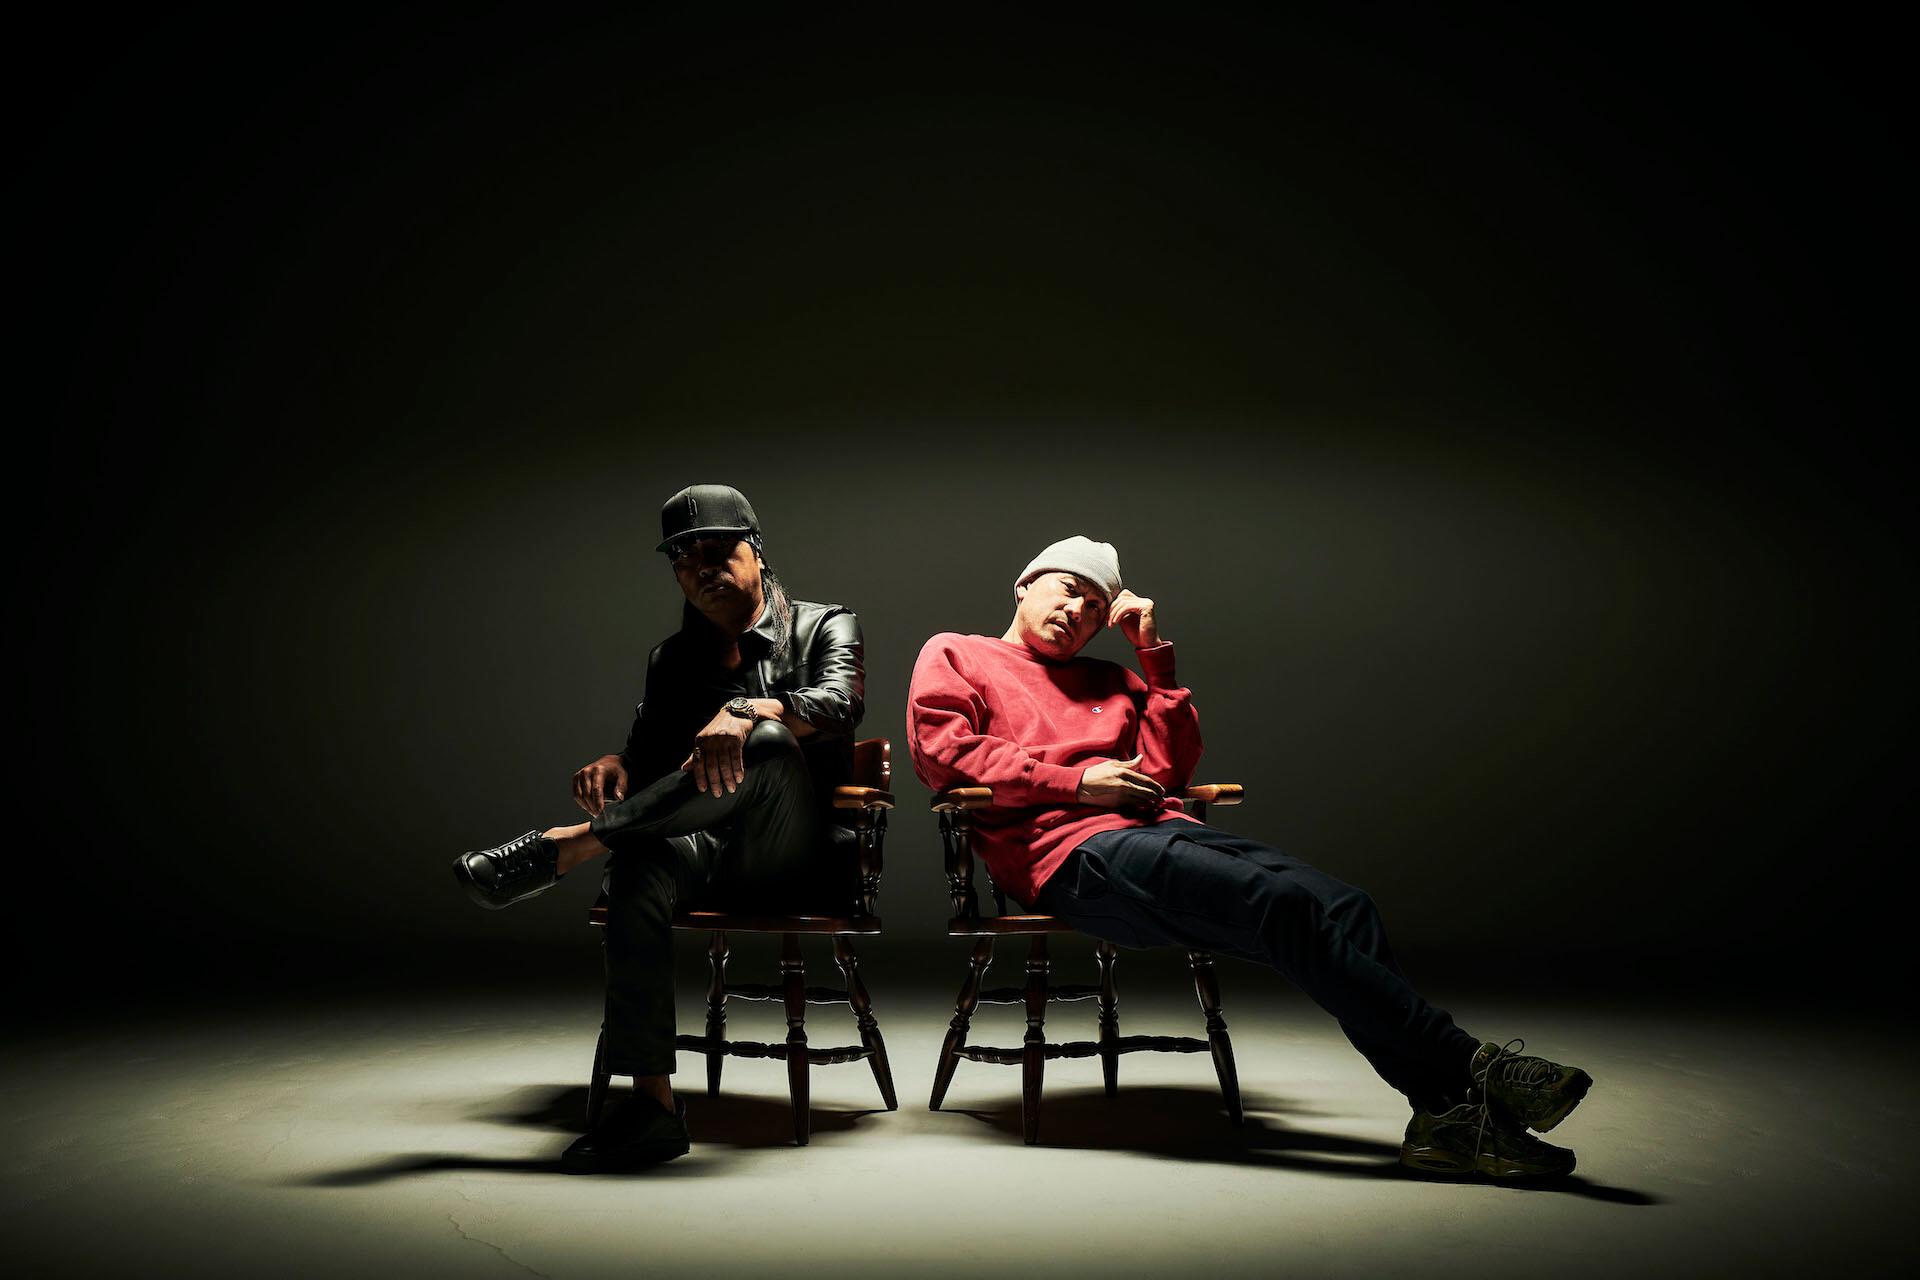 ILL-BOSSTINOとdj hondaによるアルバム『KINGS CROSS』から先行7インチがリリース決定! music210917_illbosstino_01